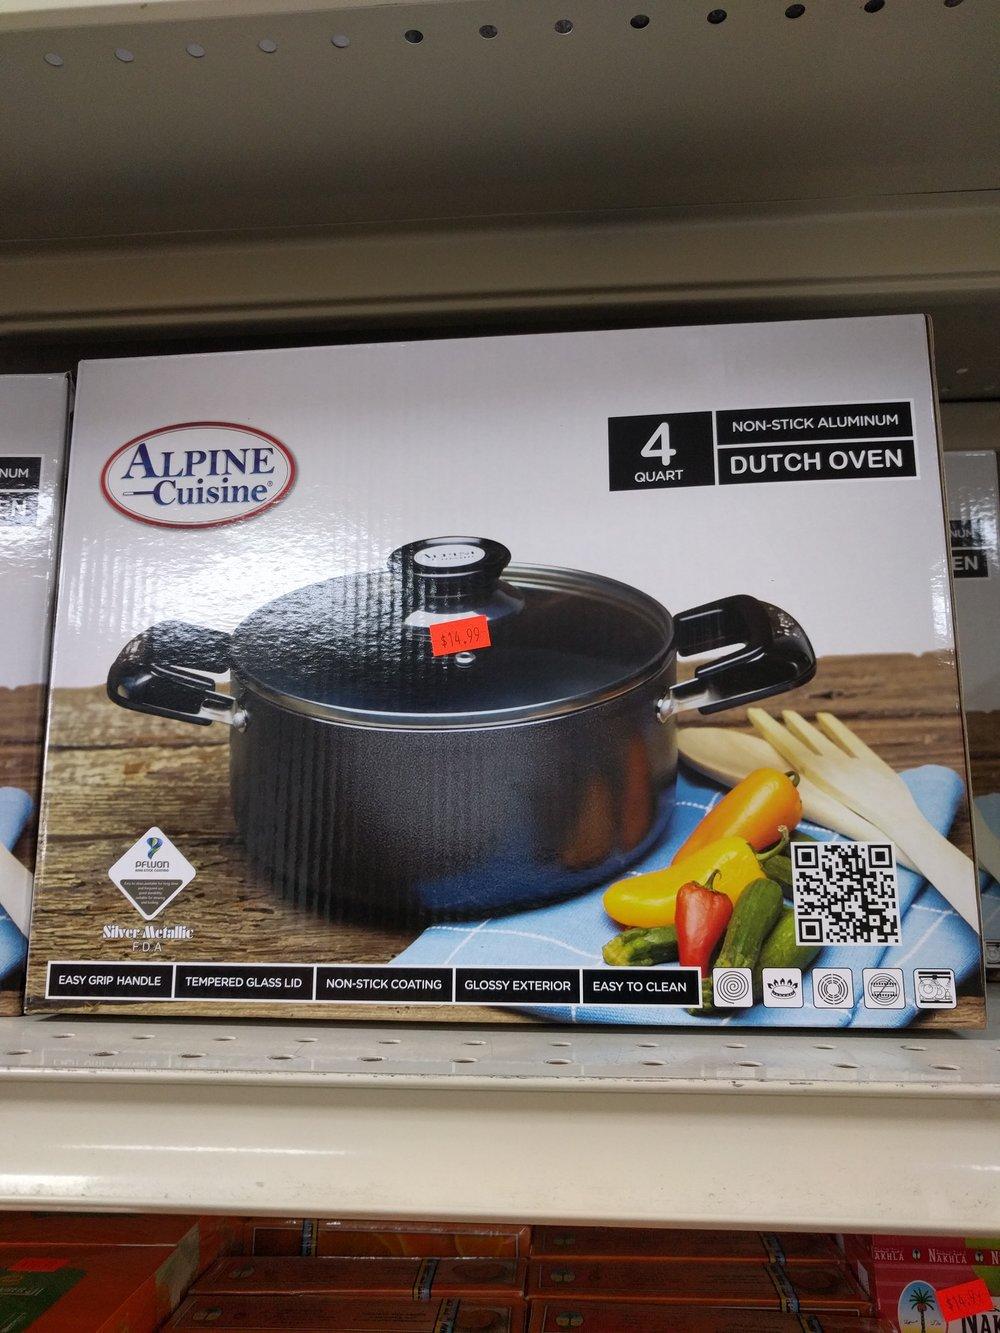 4-Quart-Diutch-Oven-Pak-Halal-Mediterranean- Grocery-Store-12259-W-87th-St-Pkwy-Lenexa-KS-66215.jpg